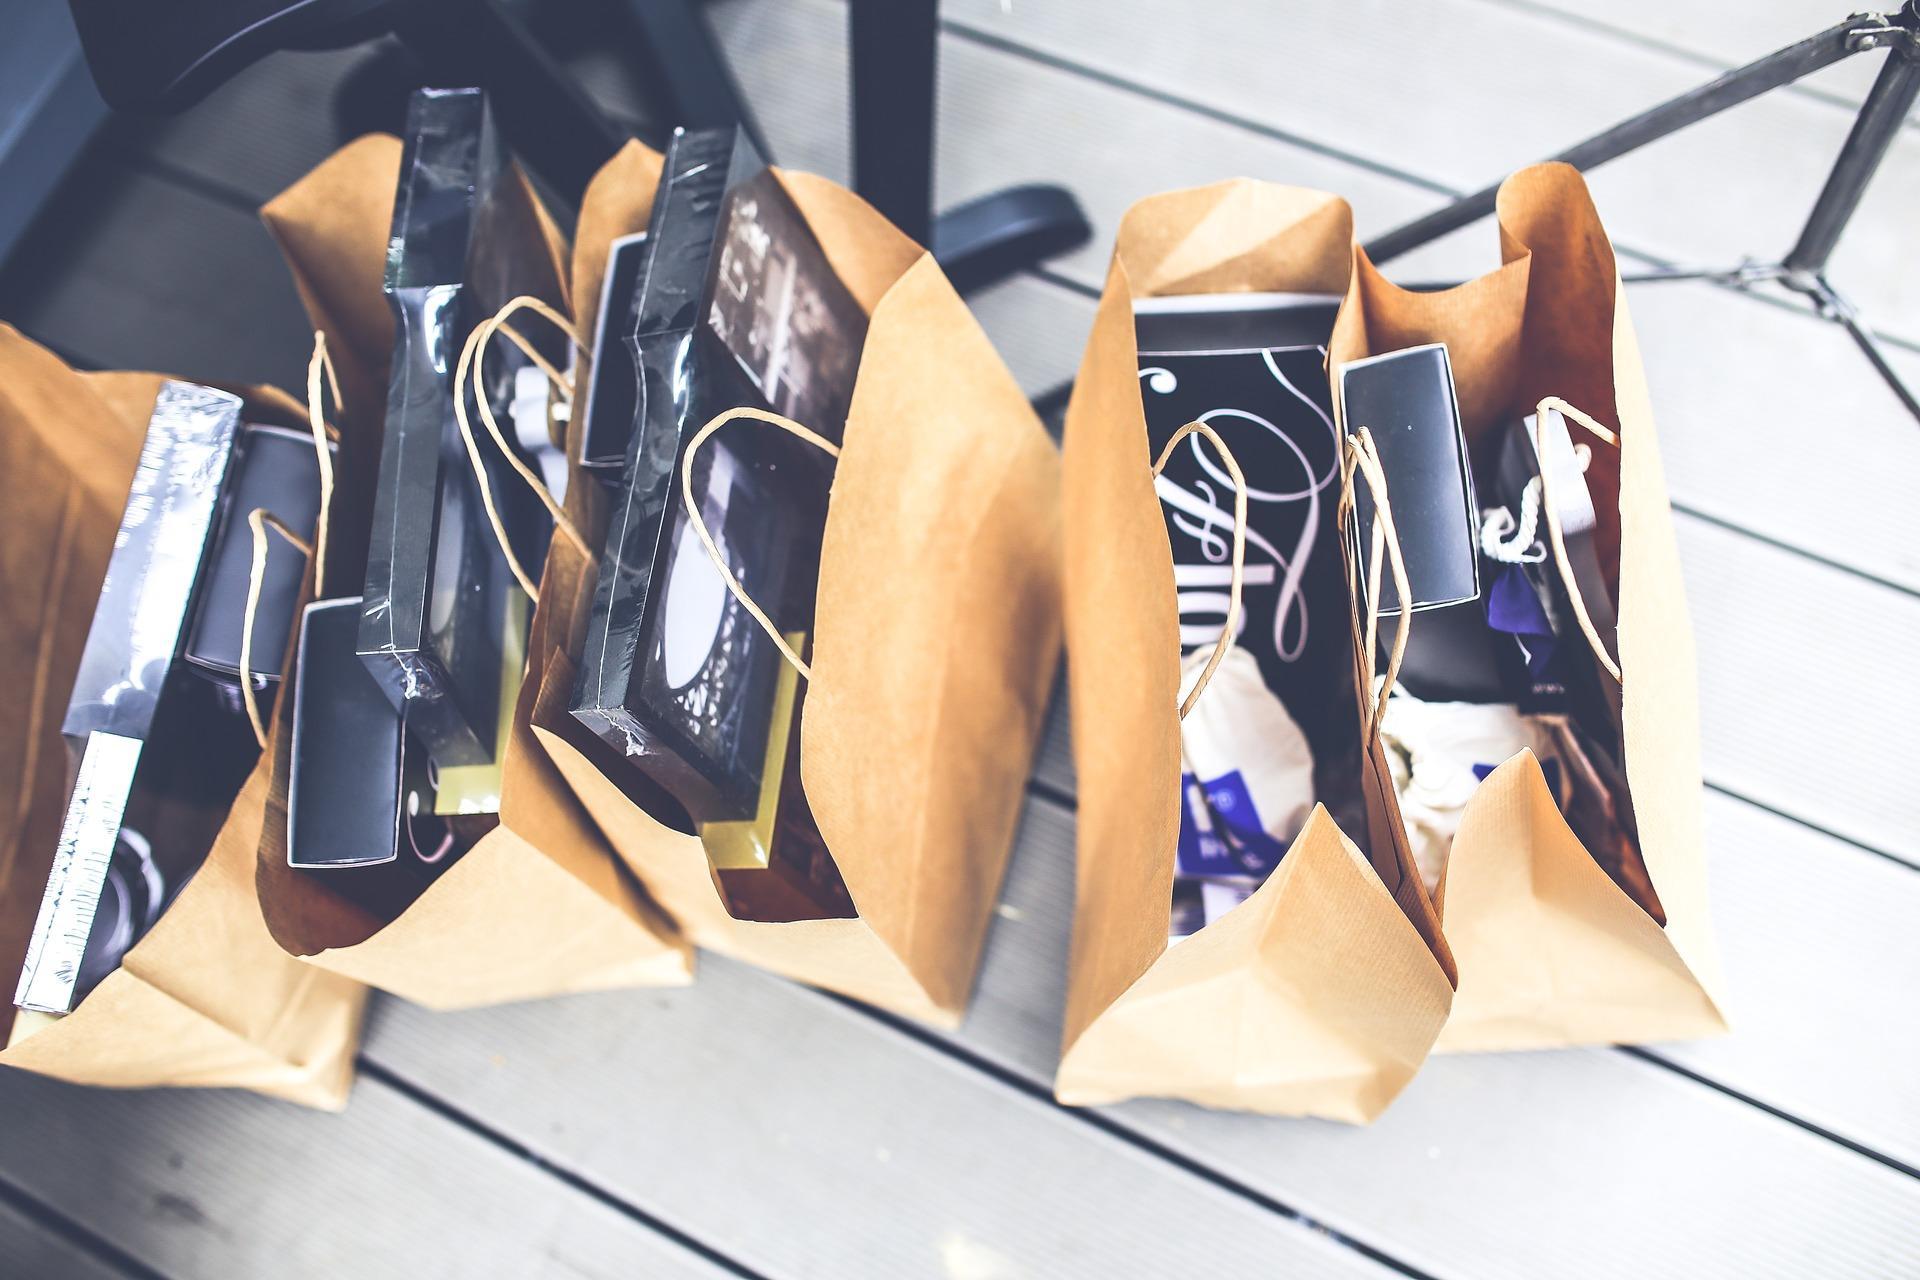 Mystery shopper